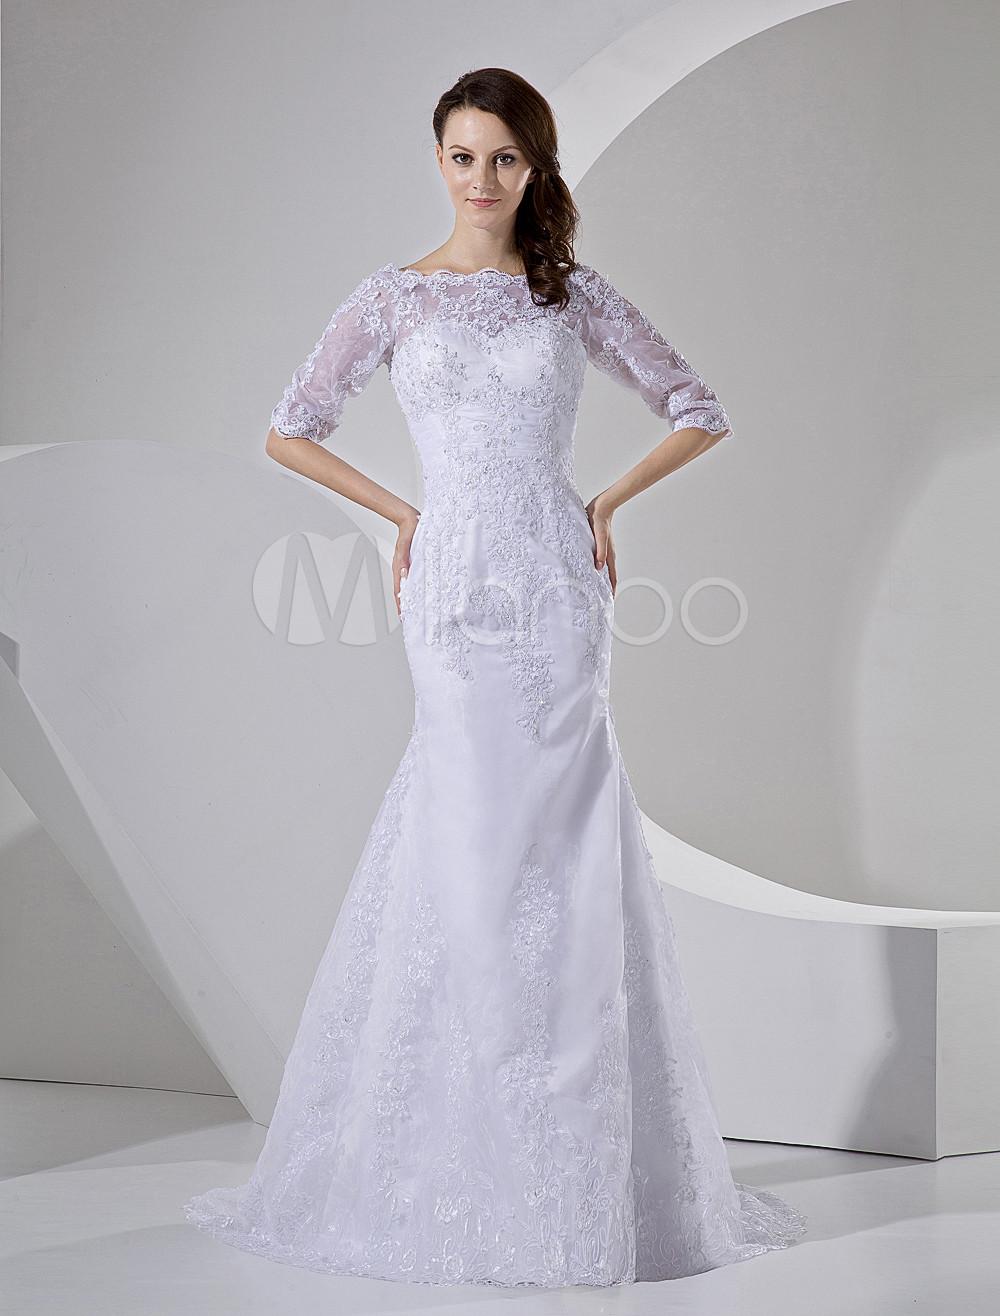 Sweep White Bride's Mermaid Wedding Dress with Bateau Neck Beading